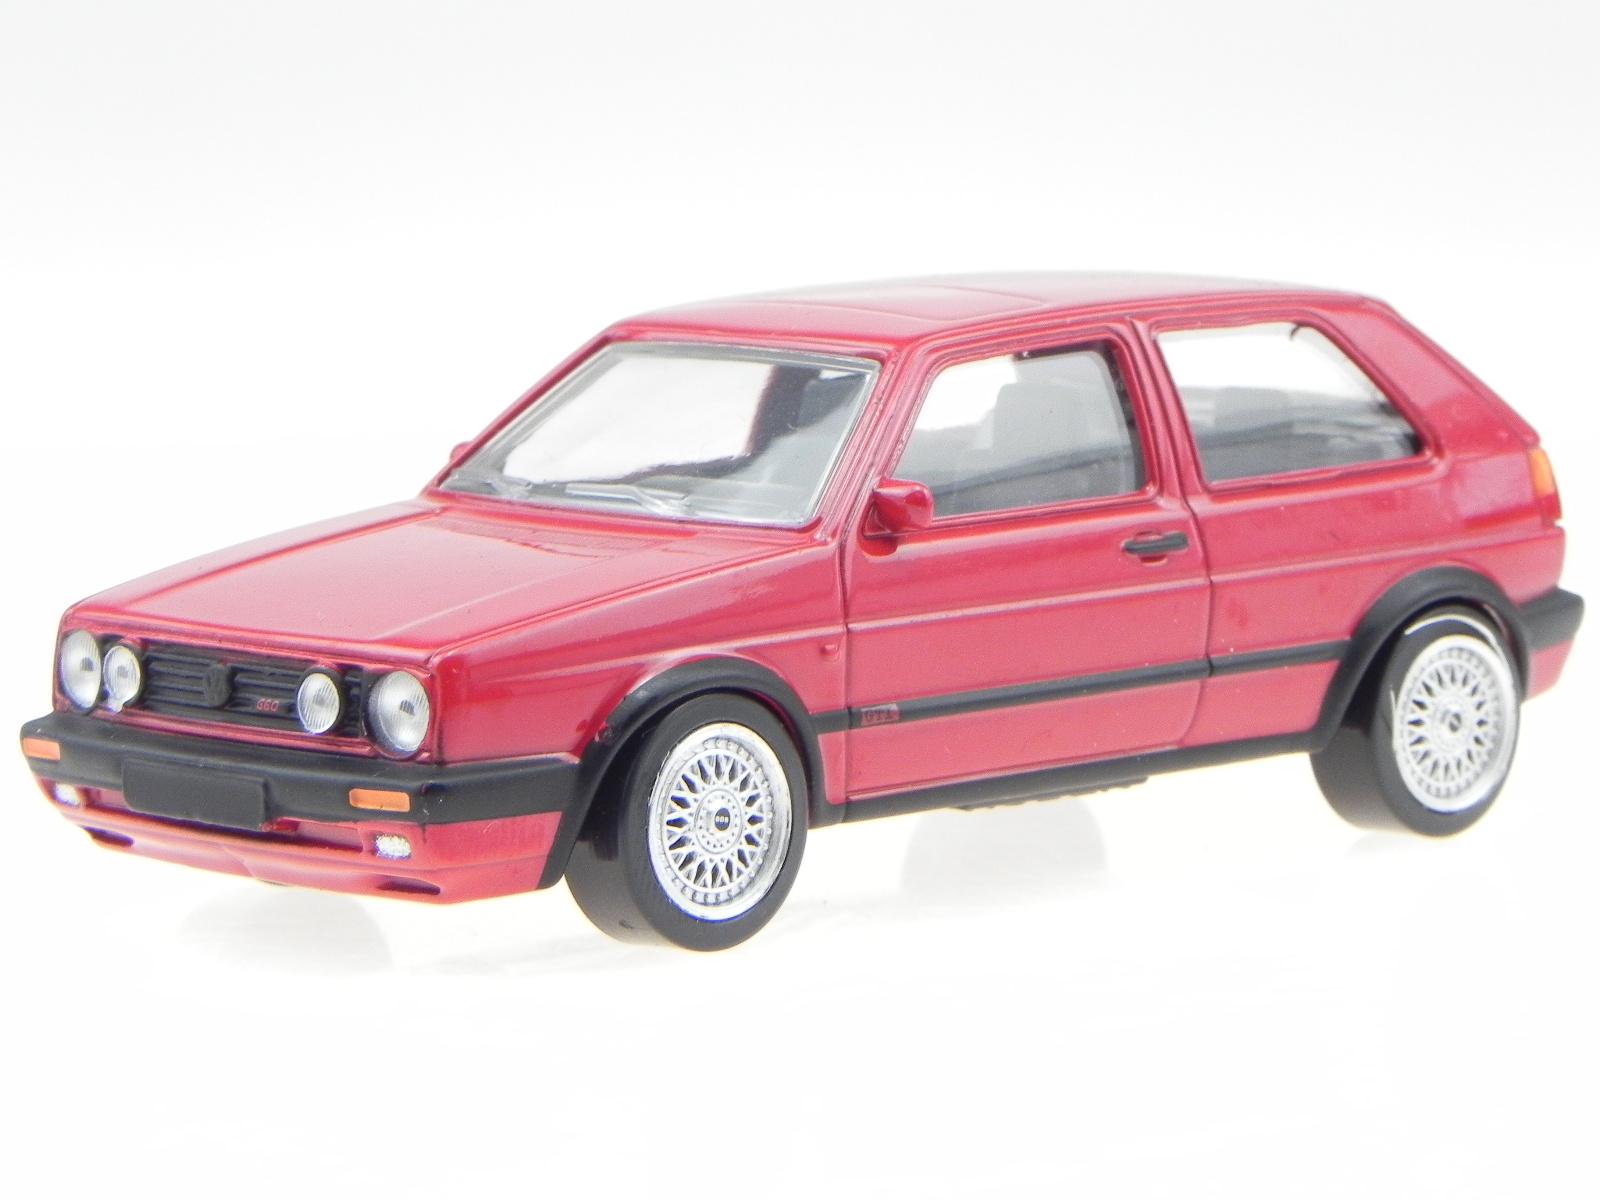 vw golf 2 gti g60 1990 rot modellauto 840062 norev 1 43 ebay. Black Bedroom Furniture Sets. Home Design Ideas